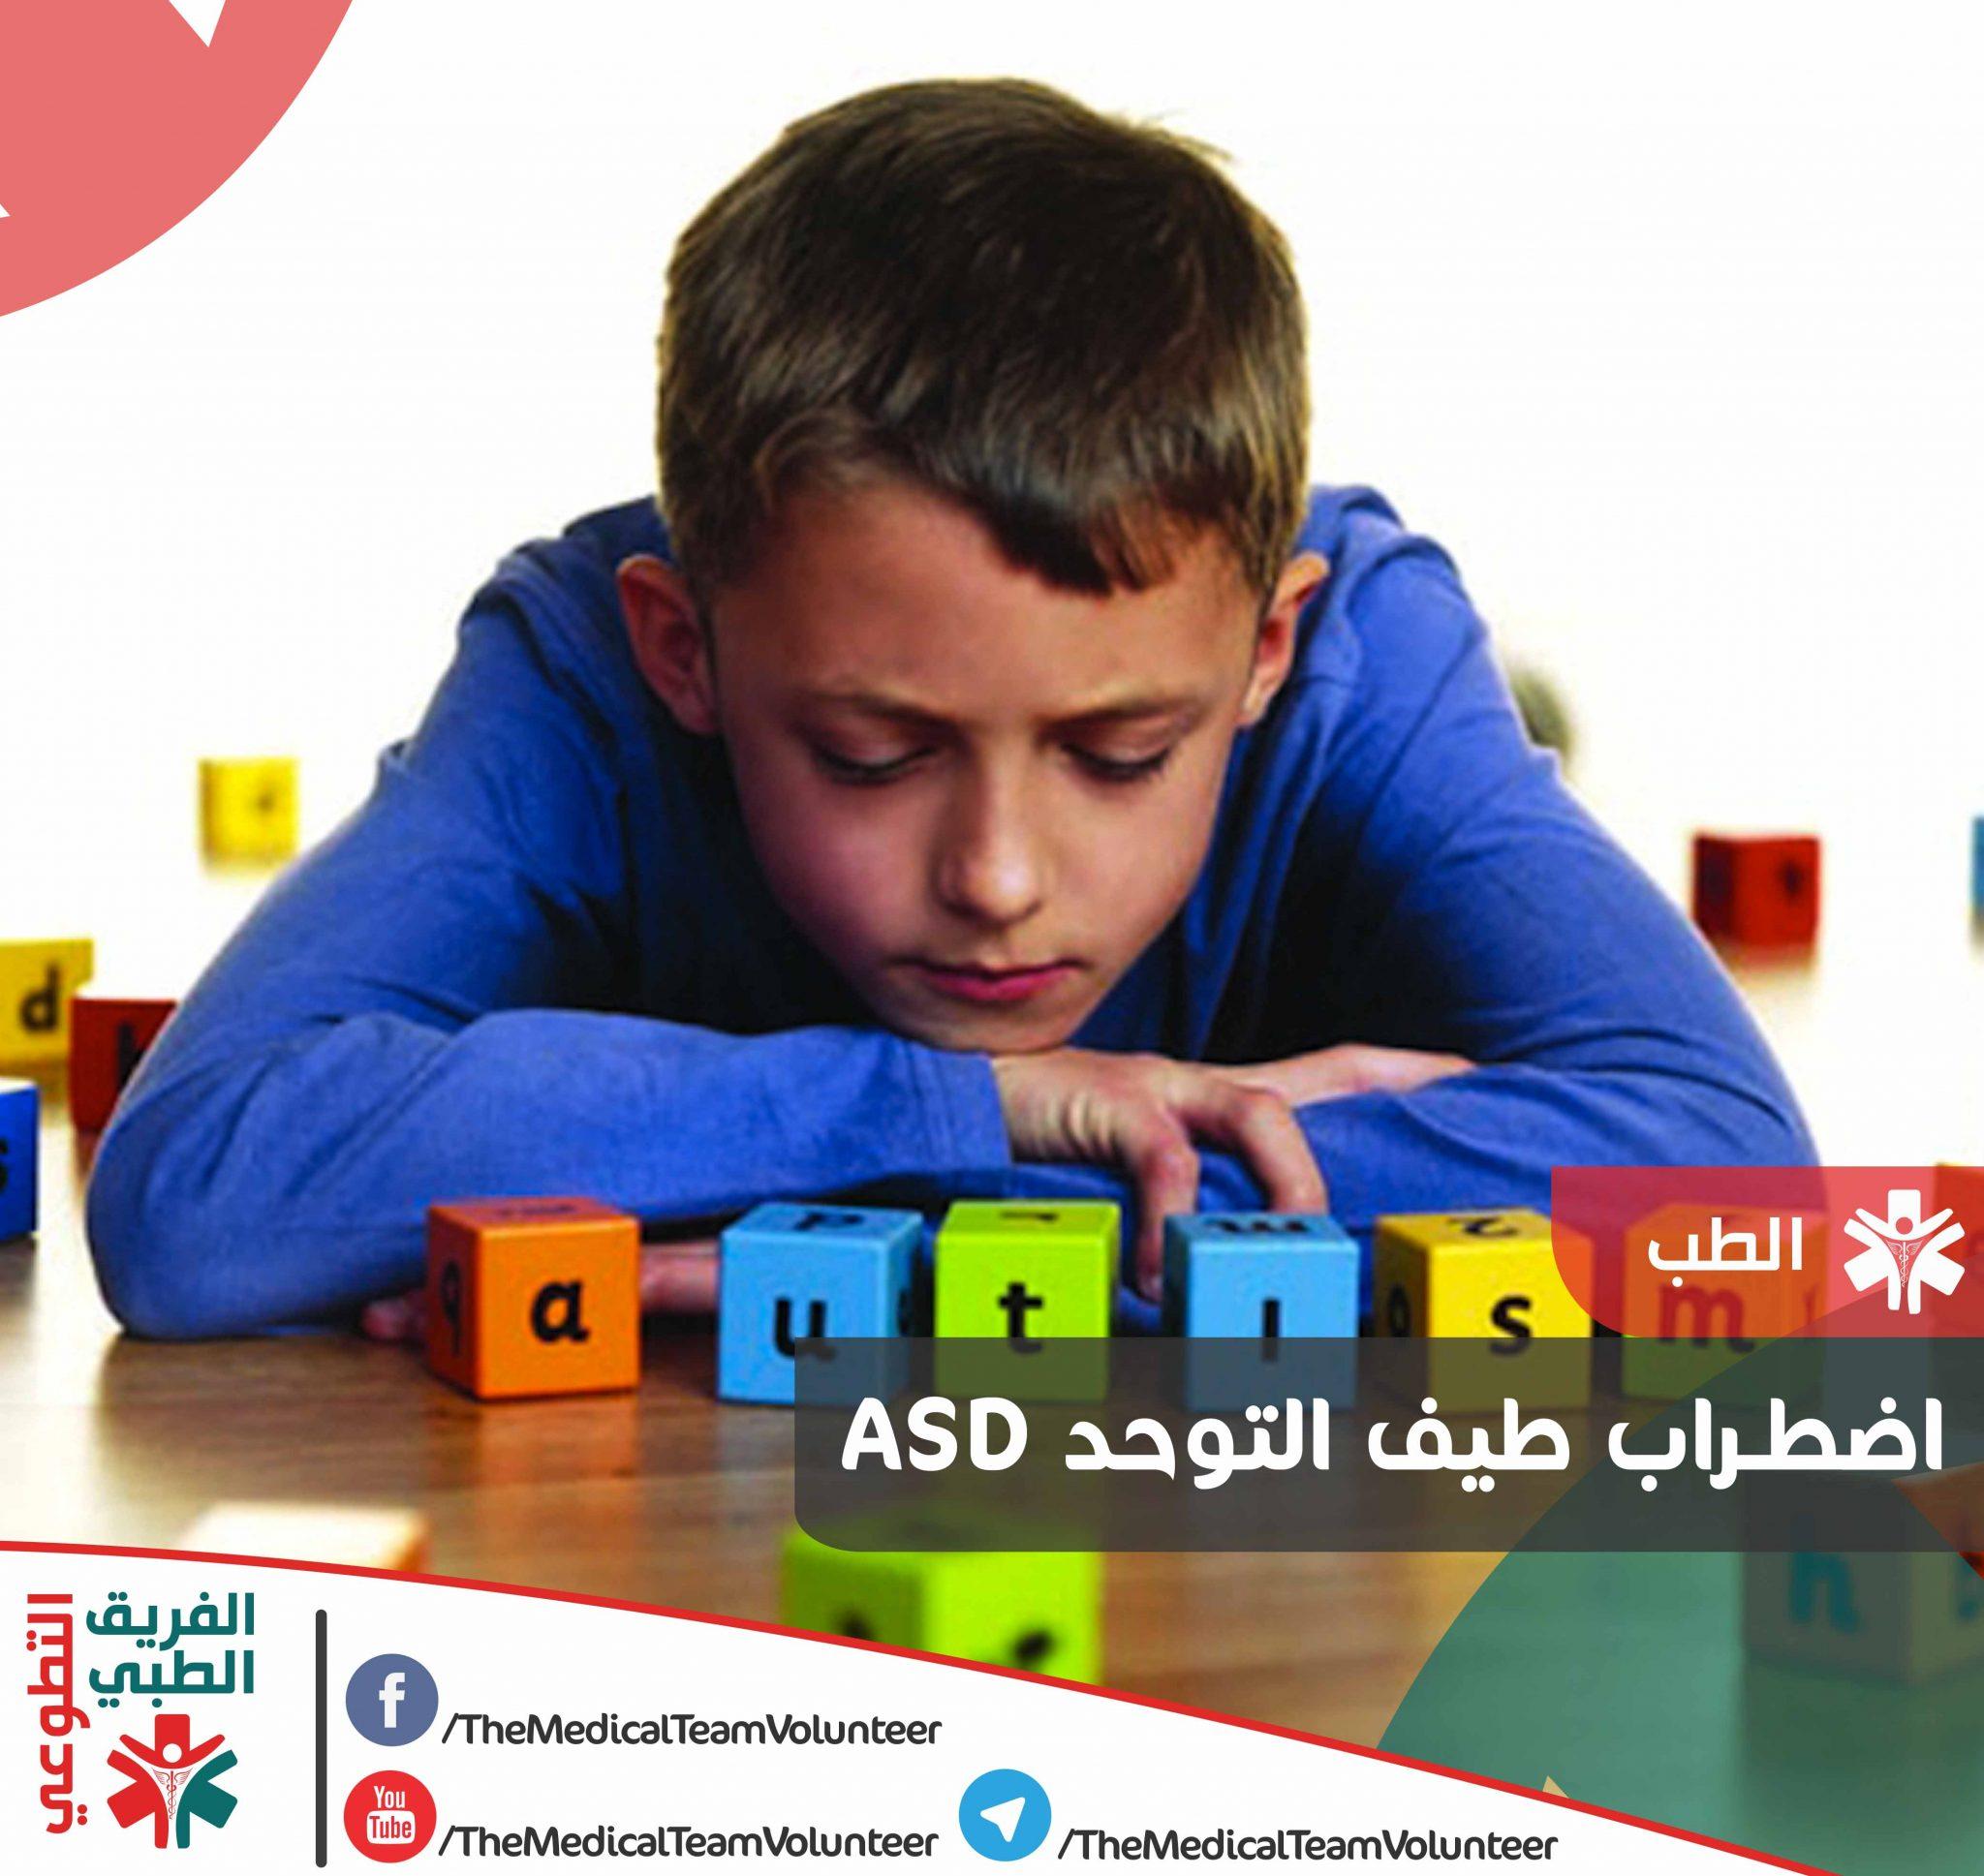 357-ASD ما هو اضطراب طيف التوحد ASD و ما هي أعراضه ؟